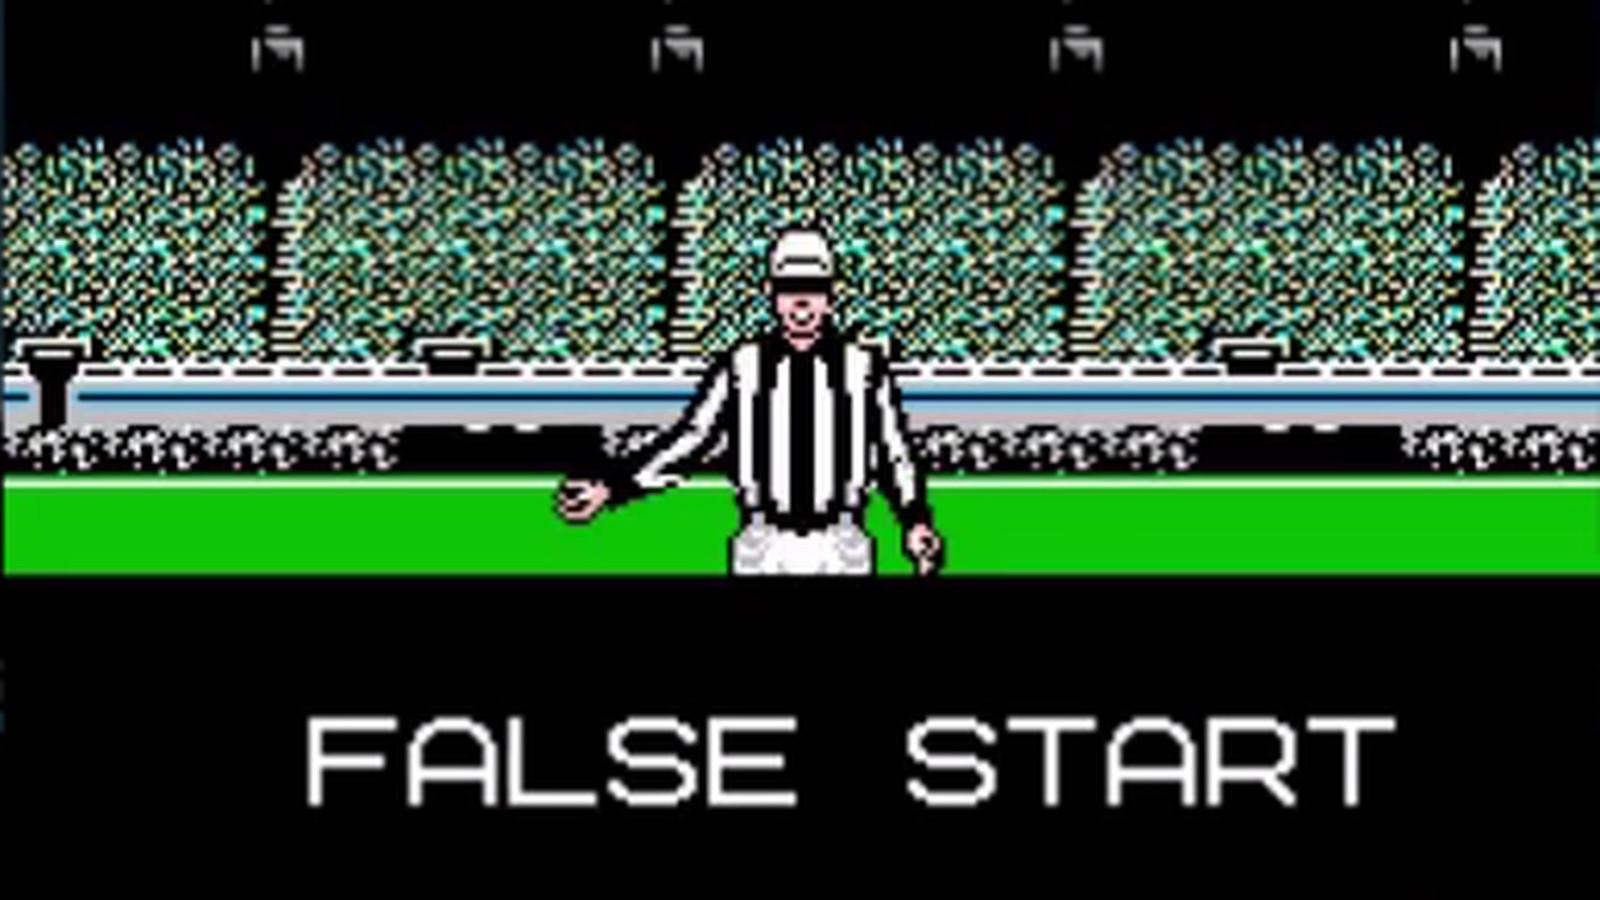 Tecmo Super Bowl is still revealing new secrets, 25 years